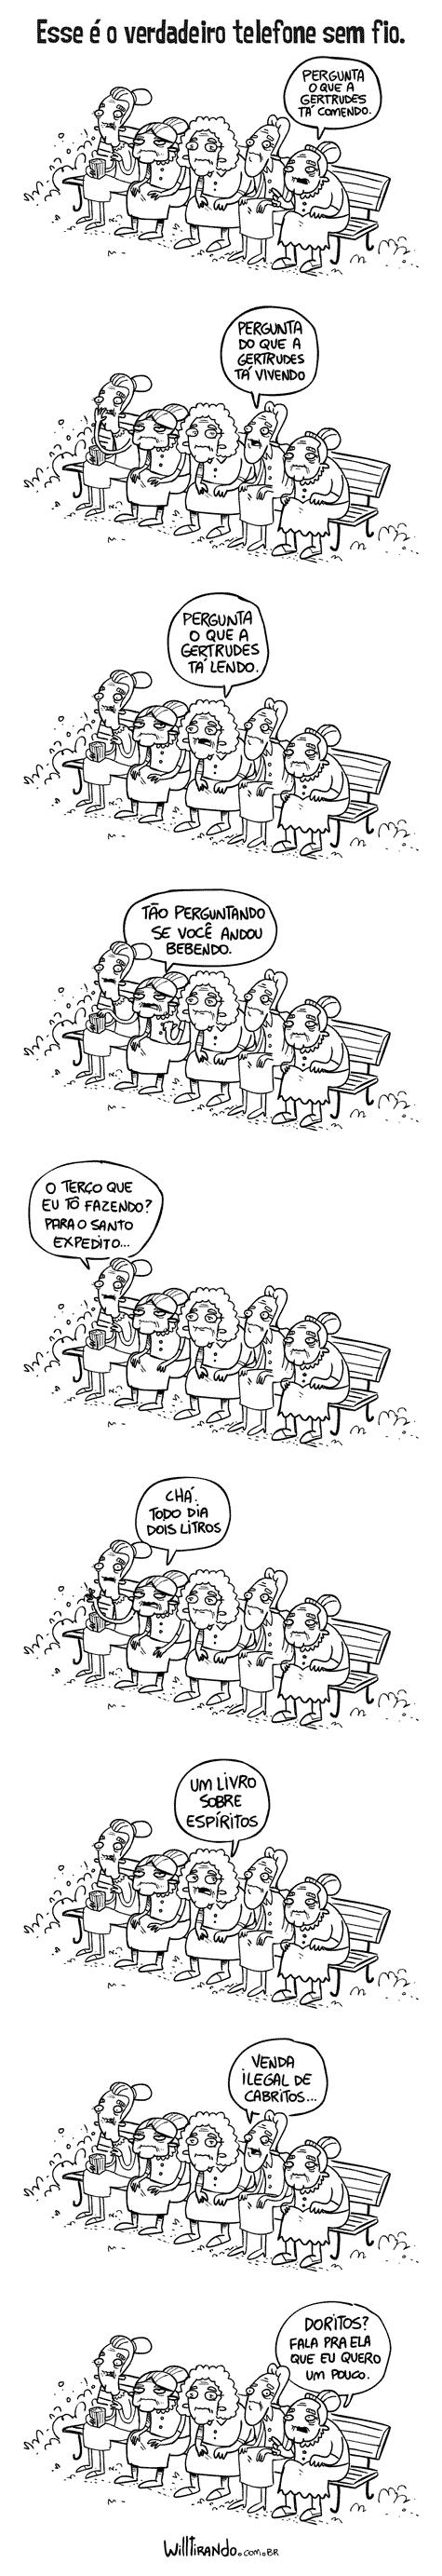 Telefone-sem-fio.png